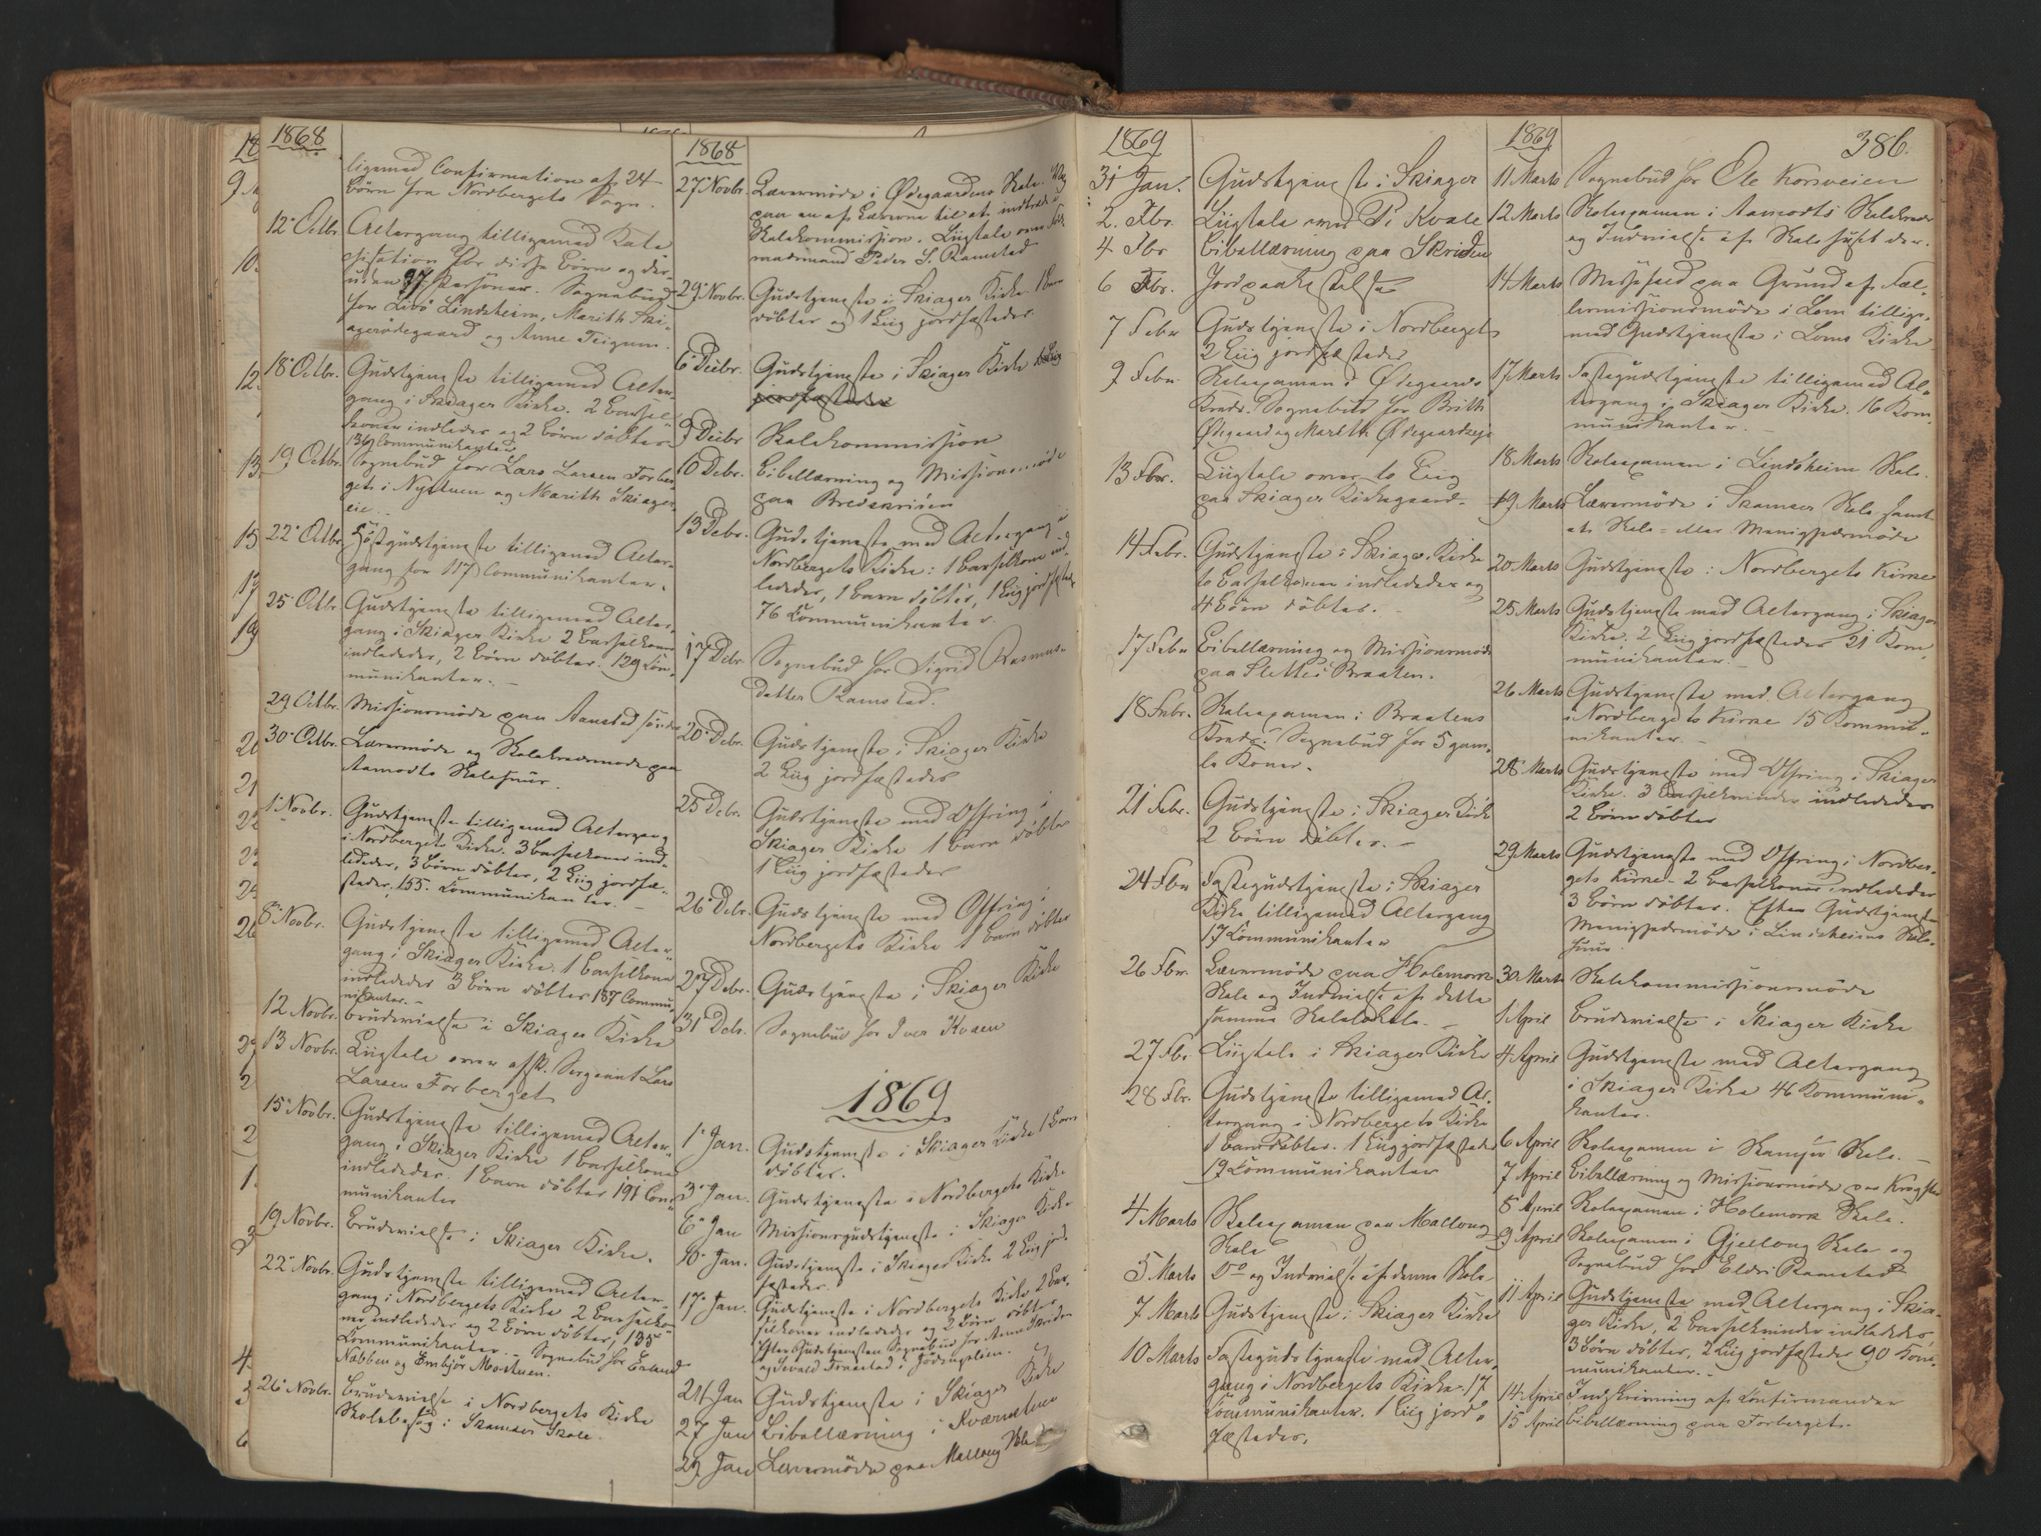 SAH, Skjåk prestekontor, Ministerialbok nr. 1, 1863-1879, s. 386